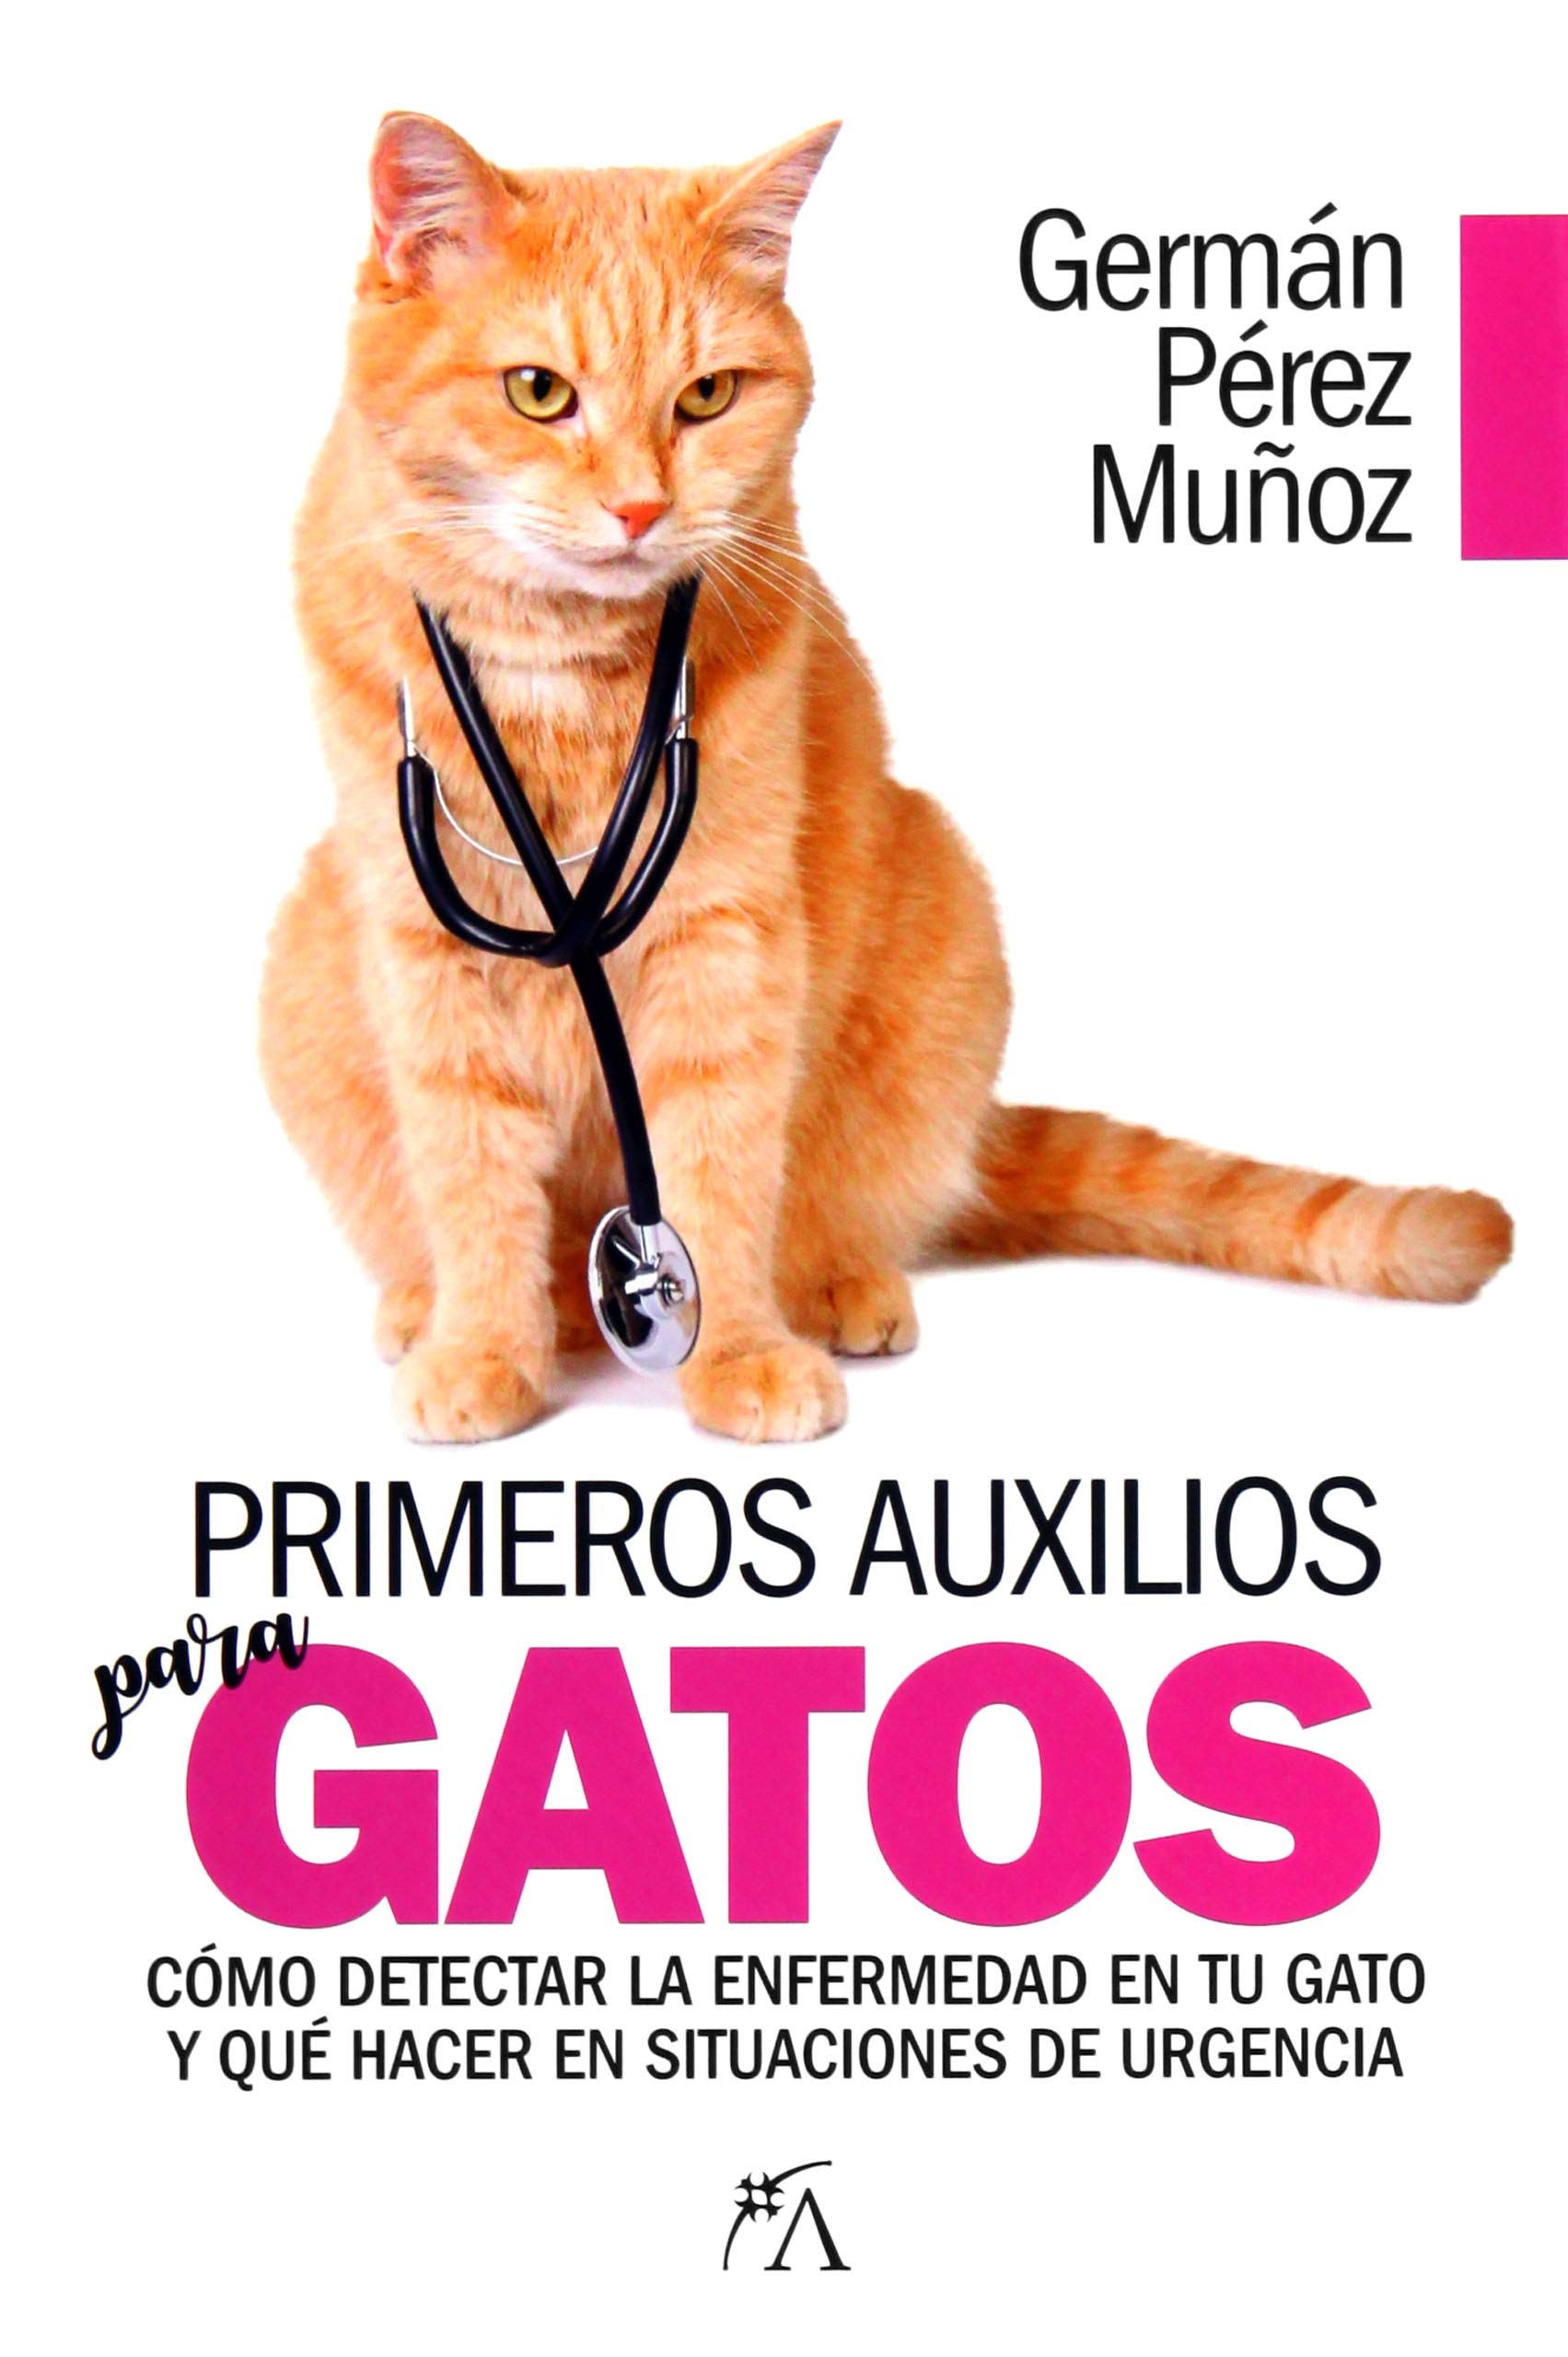 Primeros Auxilios para Gatos.: Amazon.es: Pérez Muñoz, German: Libros